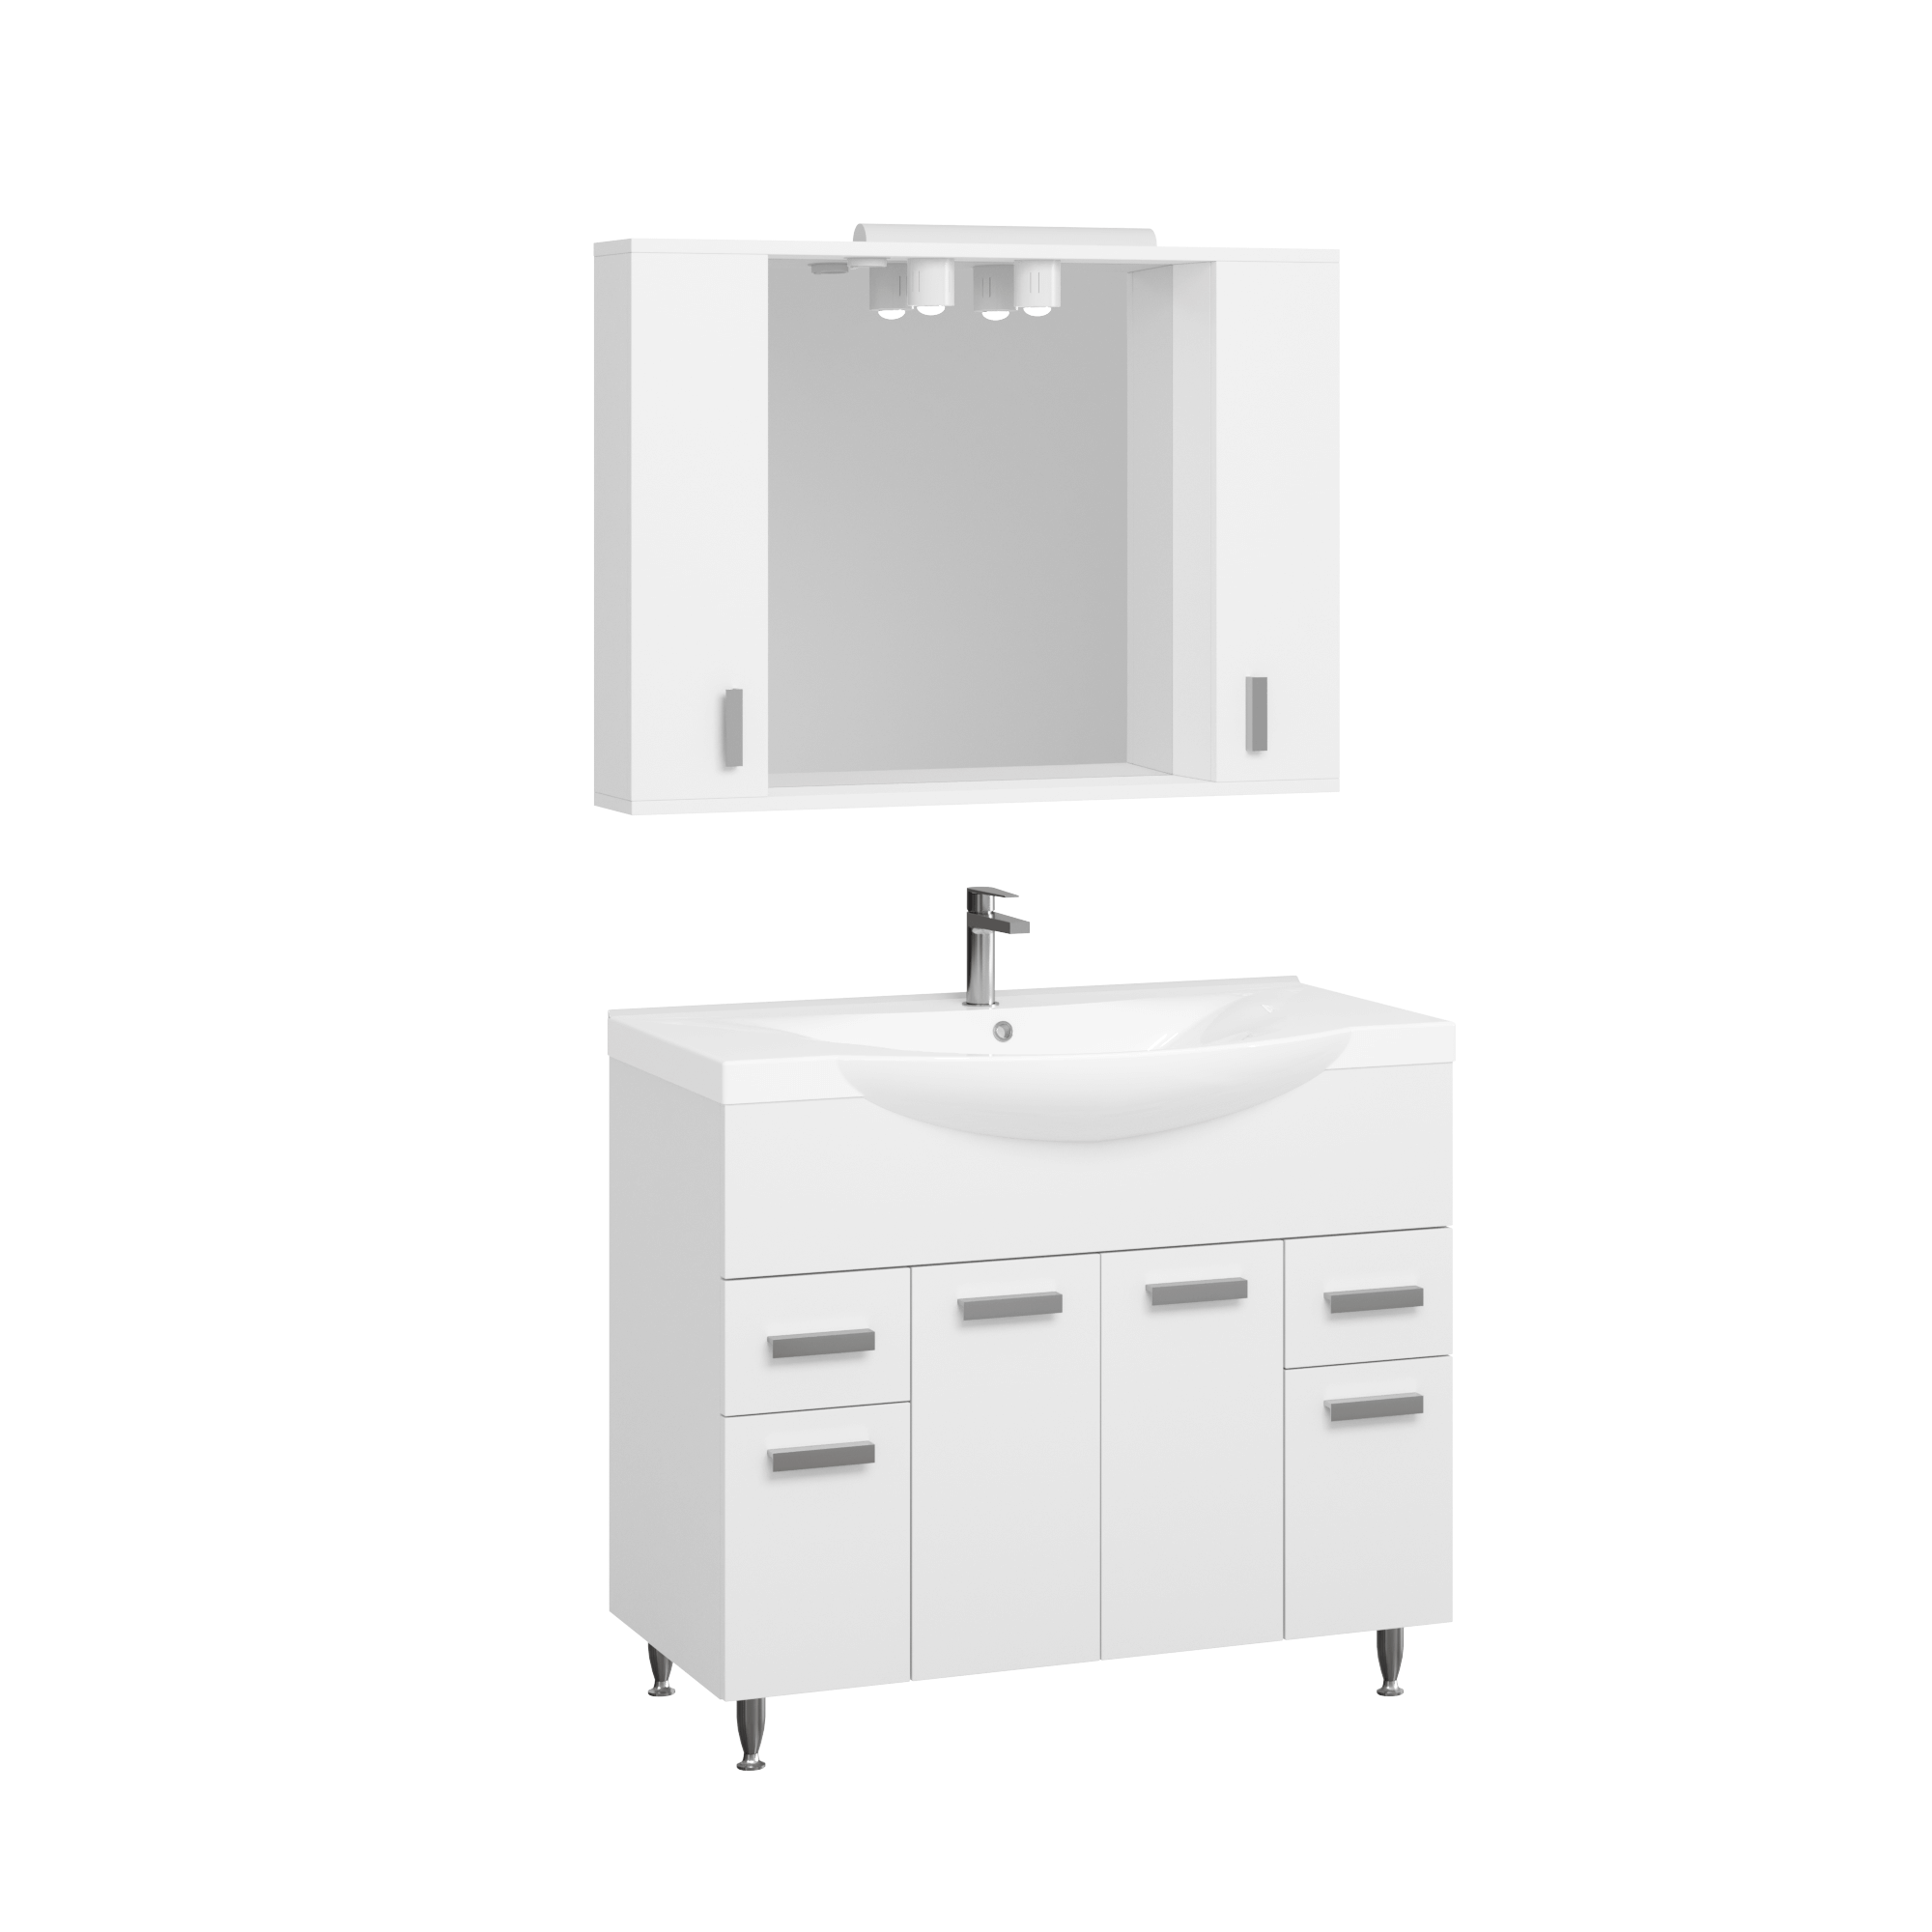 Set Mobila baie Badenmob Seria 169, PAL + MDF, baza, lavoar, oglinda, alb,  100 cm imagine 2021 mathaus